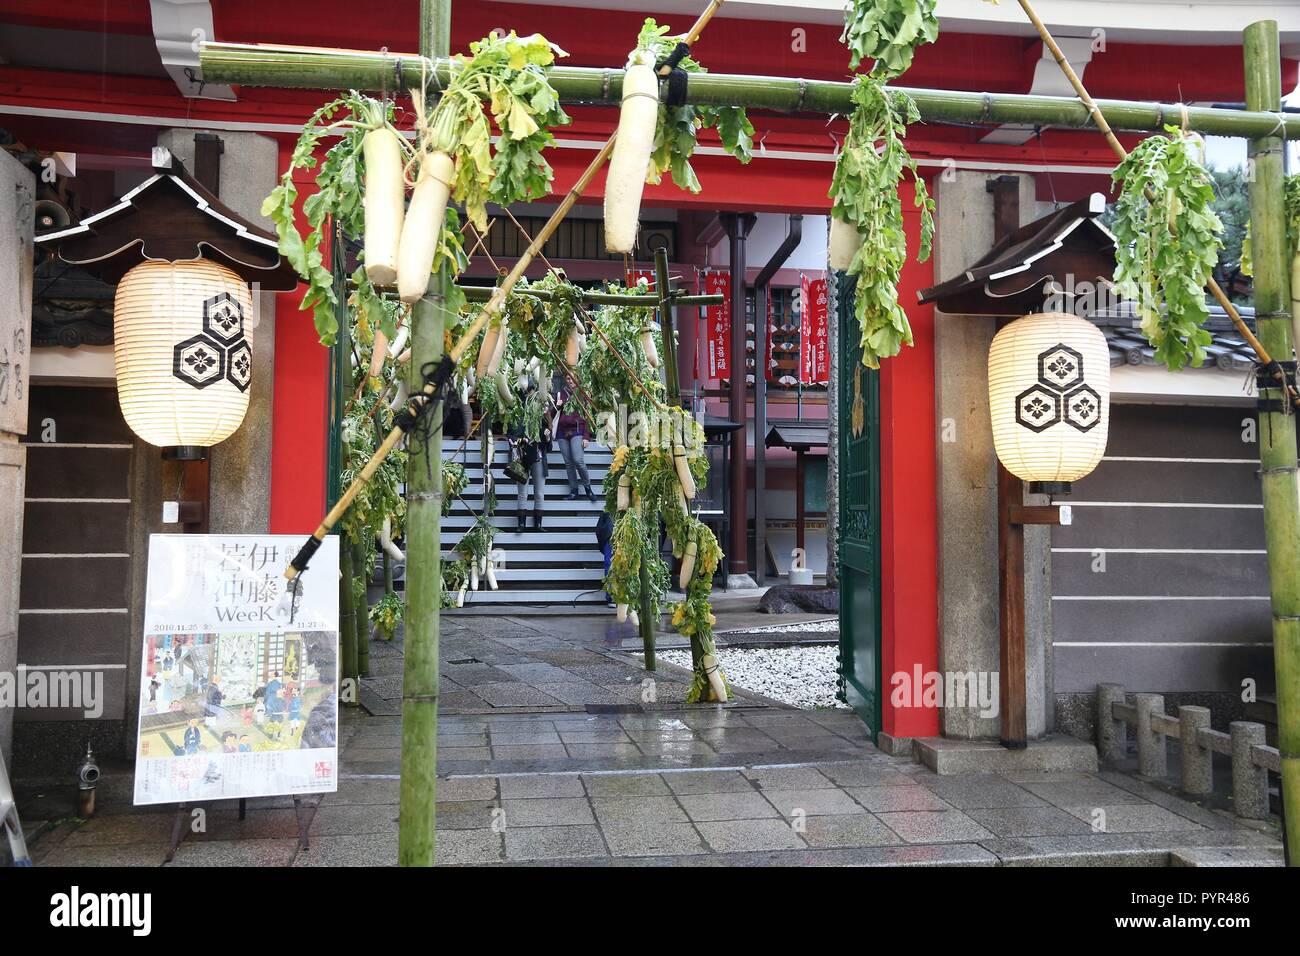 KYOTO, JAPAN - NOVEMBER 27, 2016: Seiganji Temple decorated with daikon (Japanese radish) in Kyoto to celebrate 300th anniversary of Ito Jakuchu artwo - Stock Image